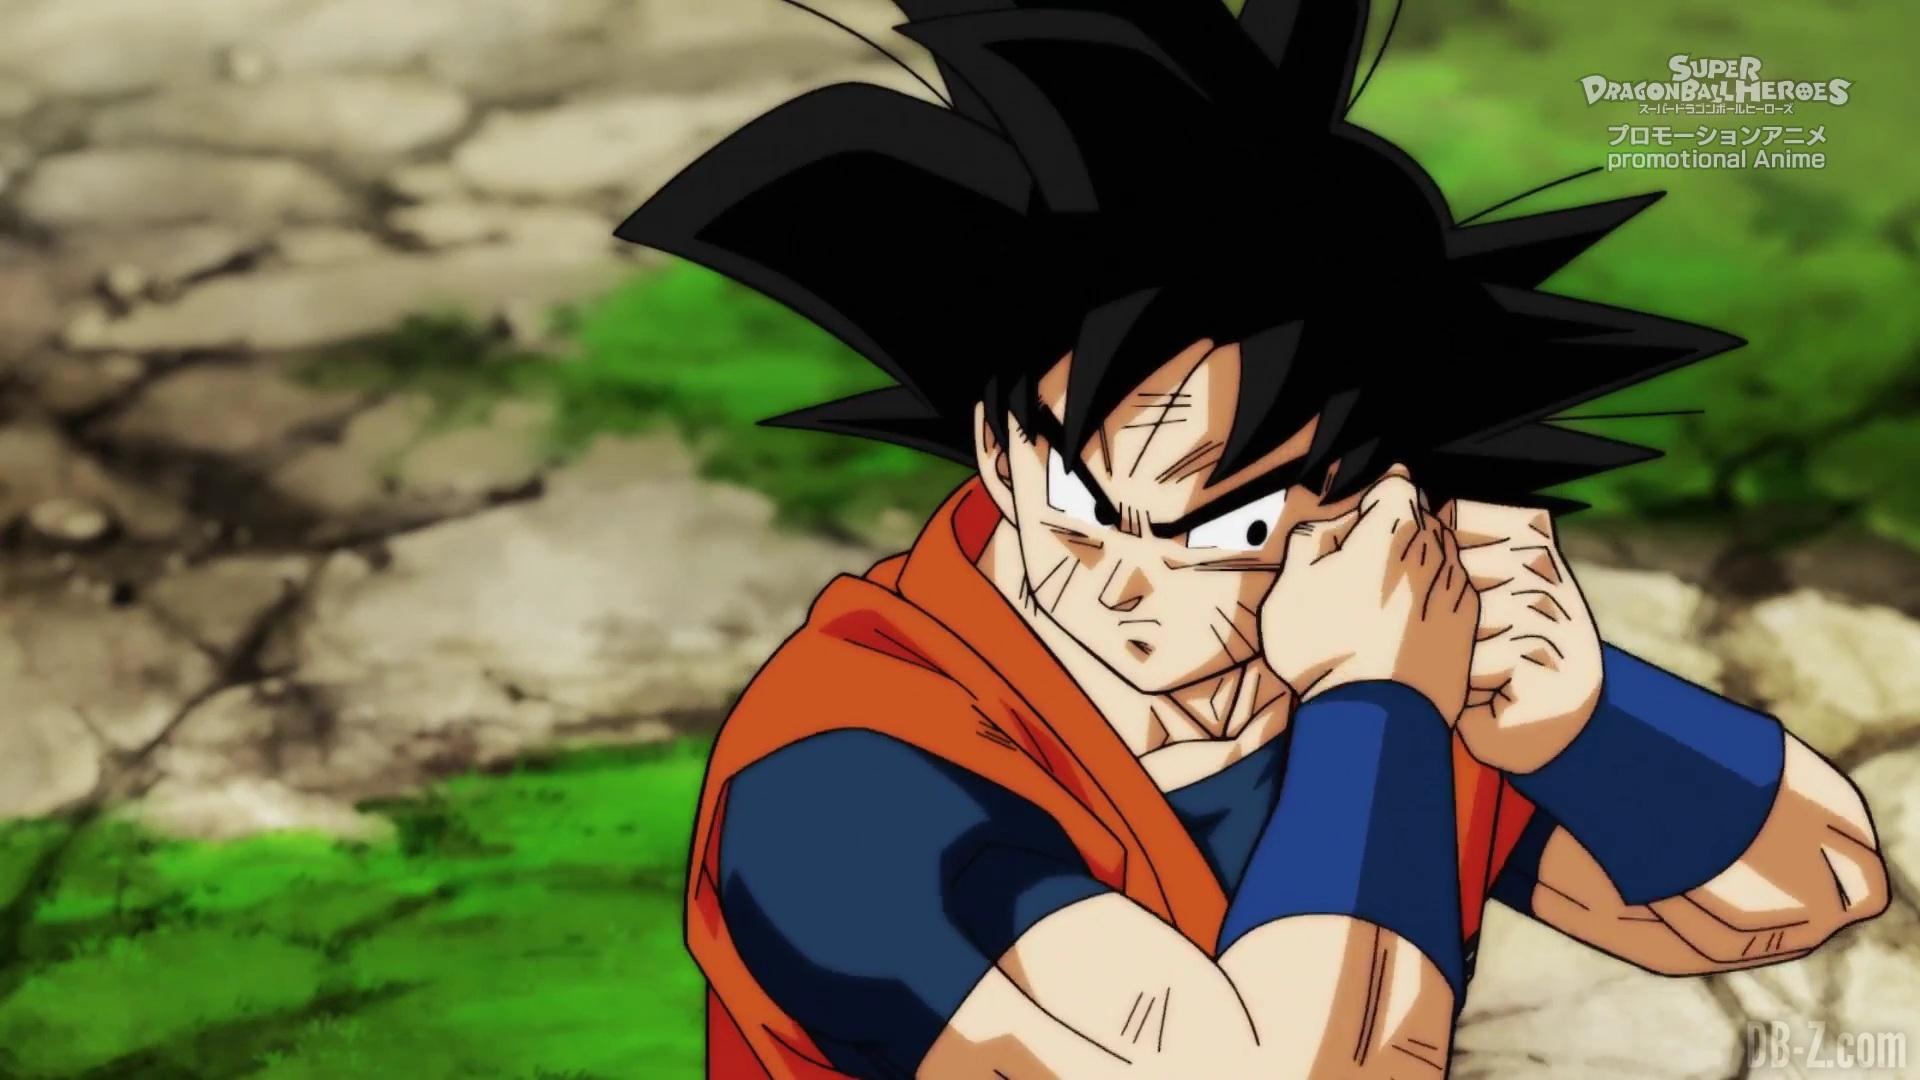 Dragon Ball Heroes Folge 2